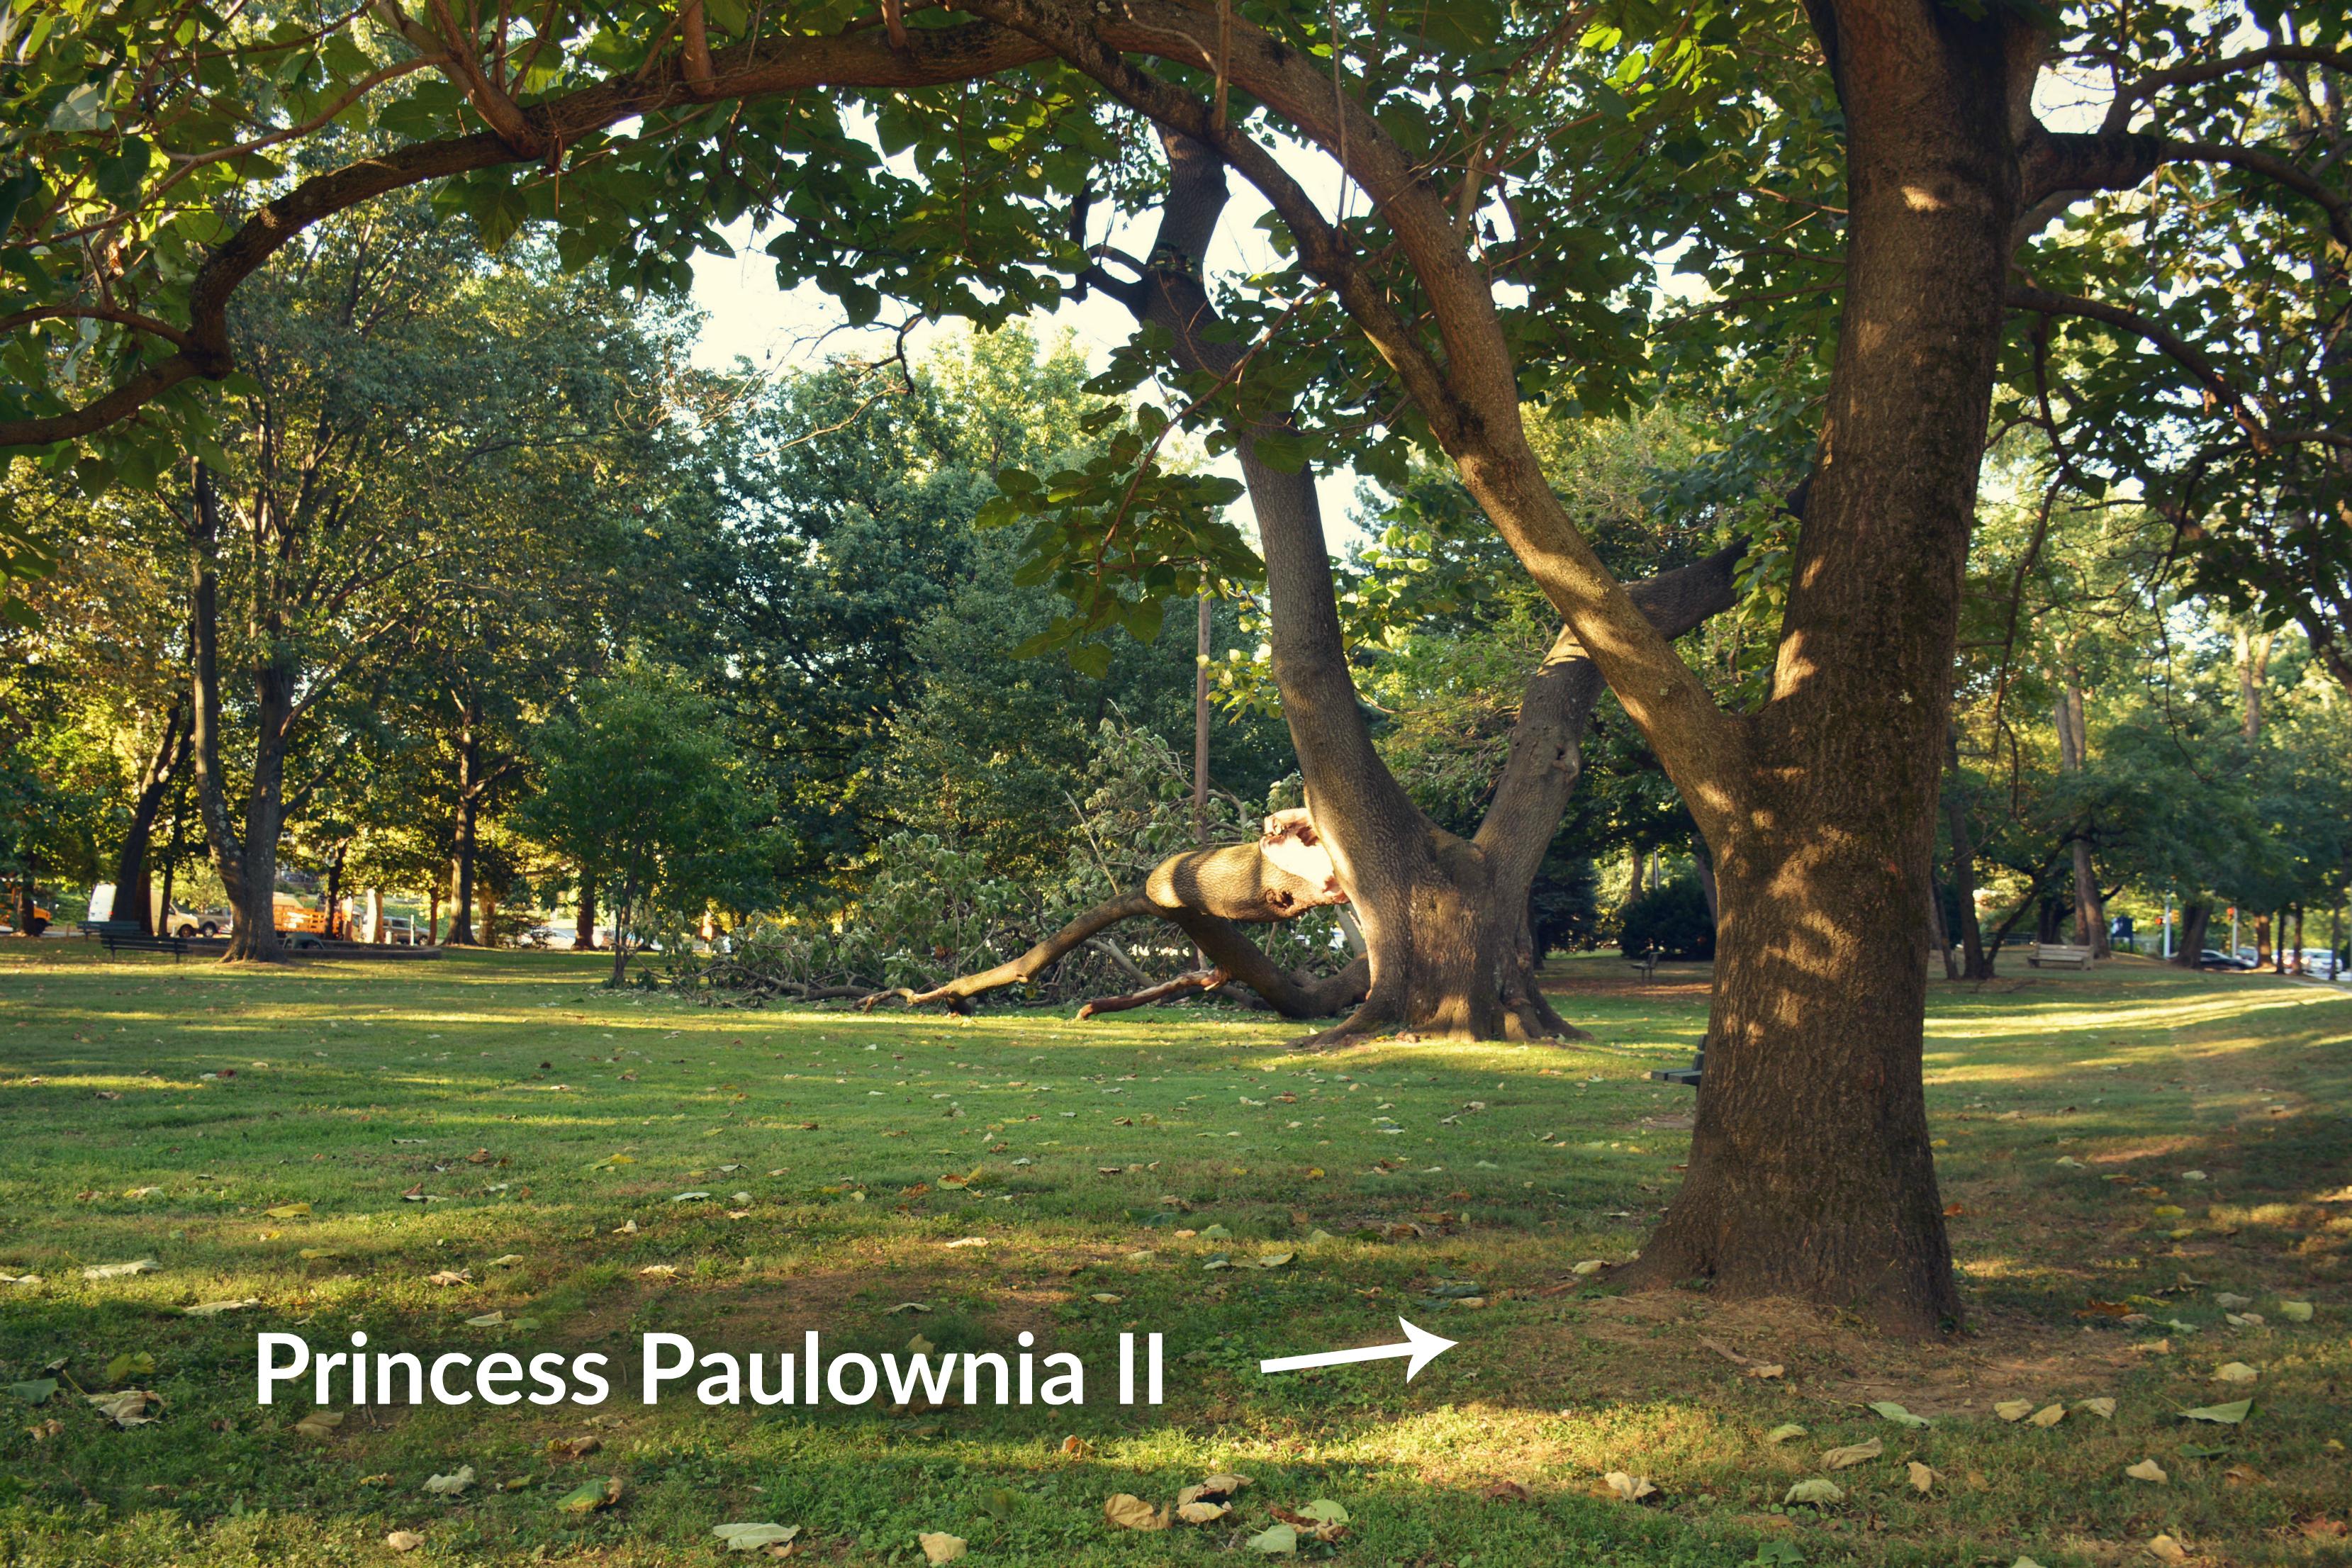 eastfallslocal-9-15-mcmichael-tree-down-paulowania-offspring-txt